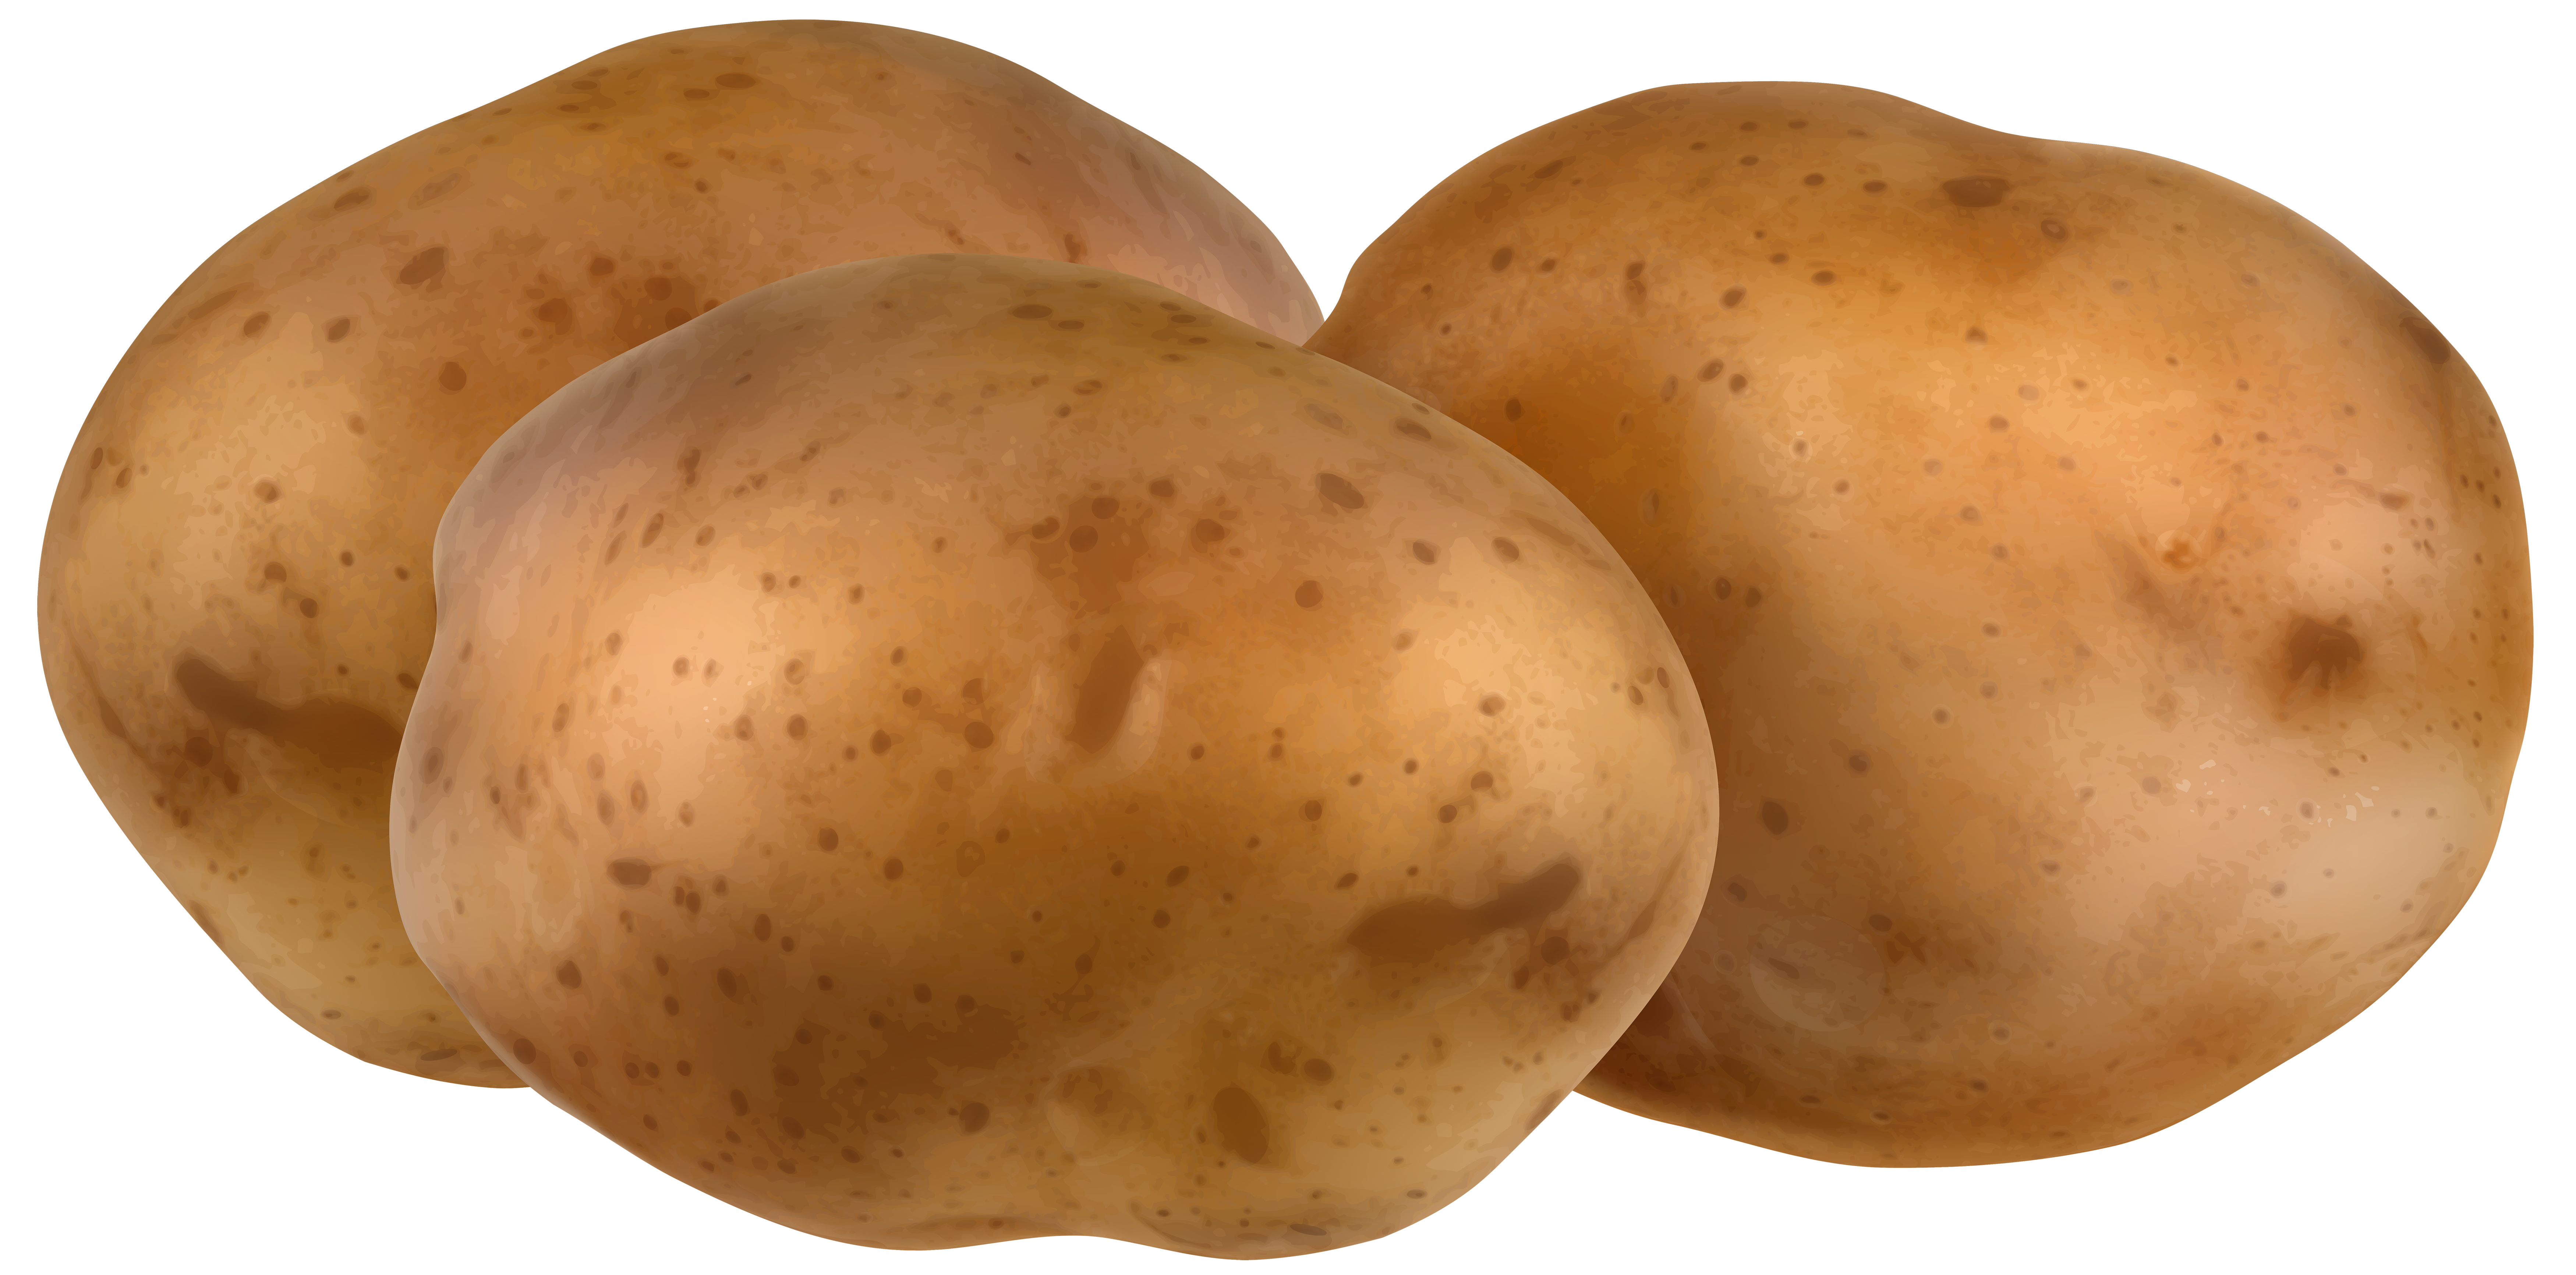 Potatoes Transparent PNG Clip Art Image.